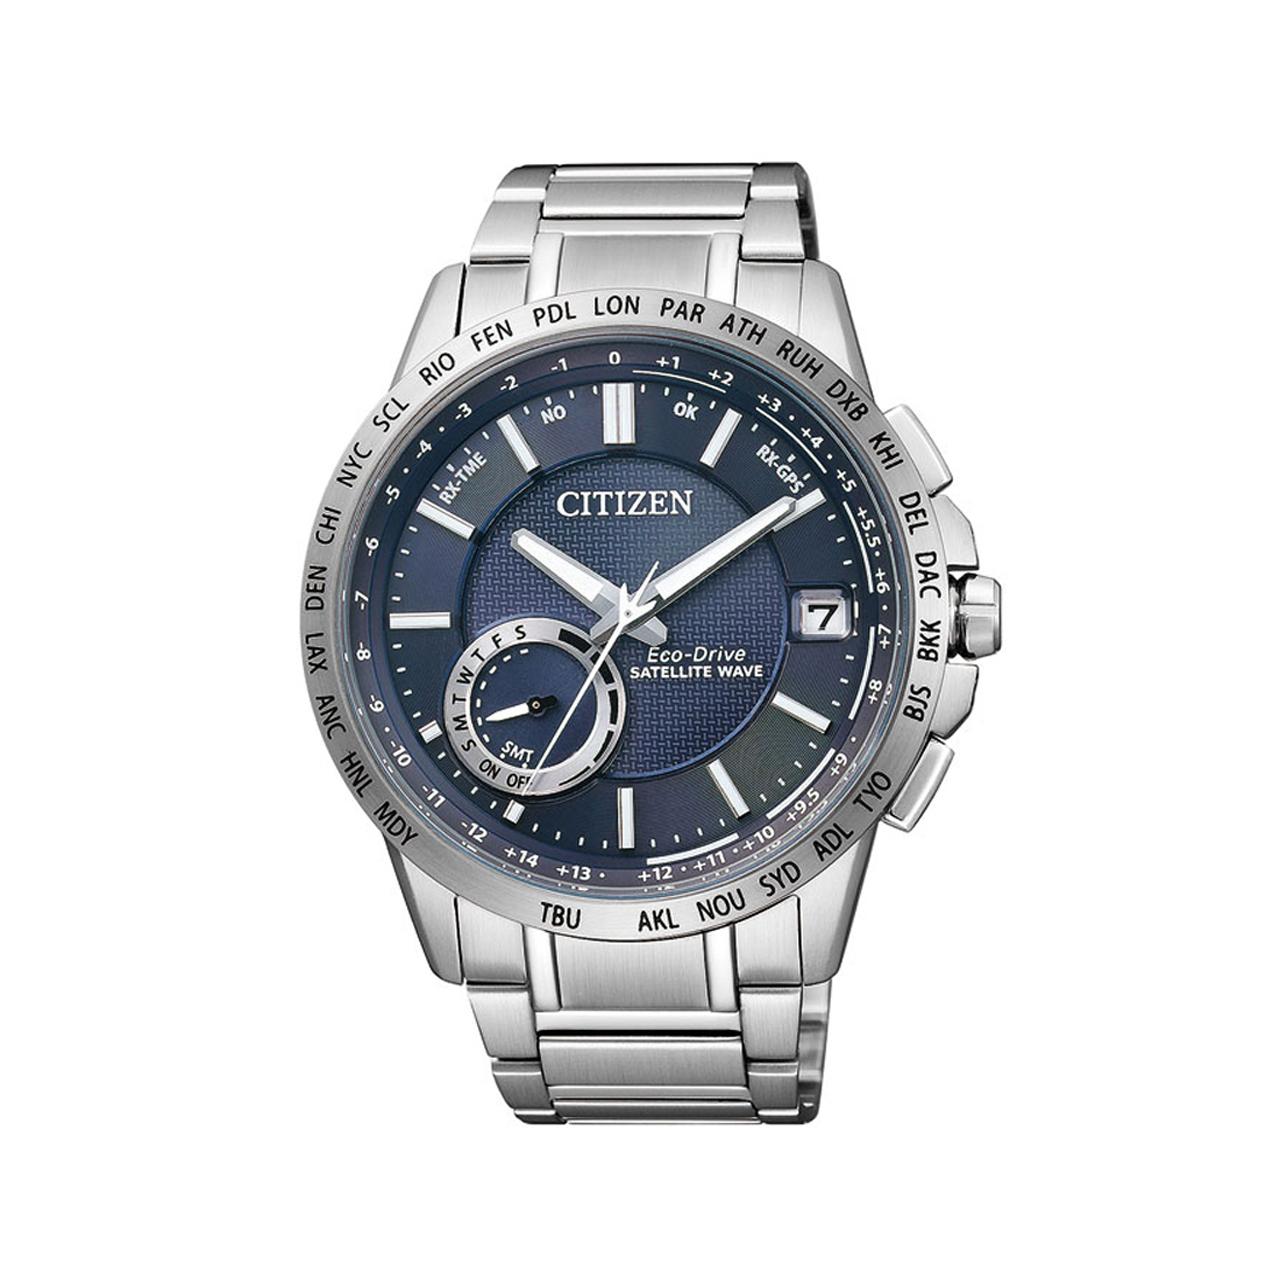 Citizen Elegant Herren Armbanduhr Eco Drive CC3000-54L